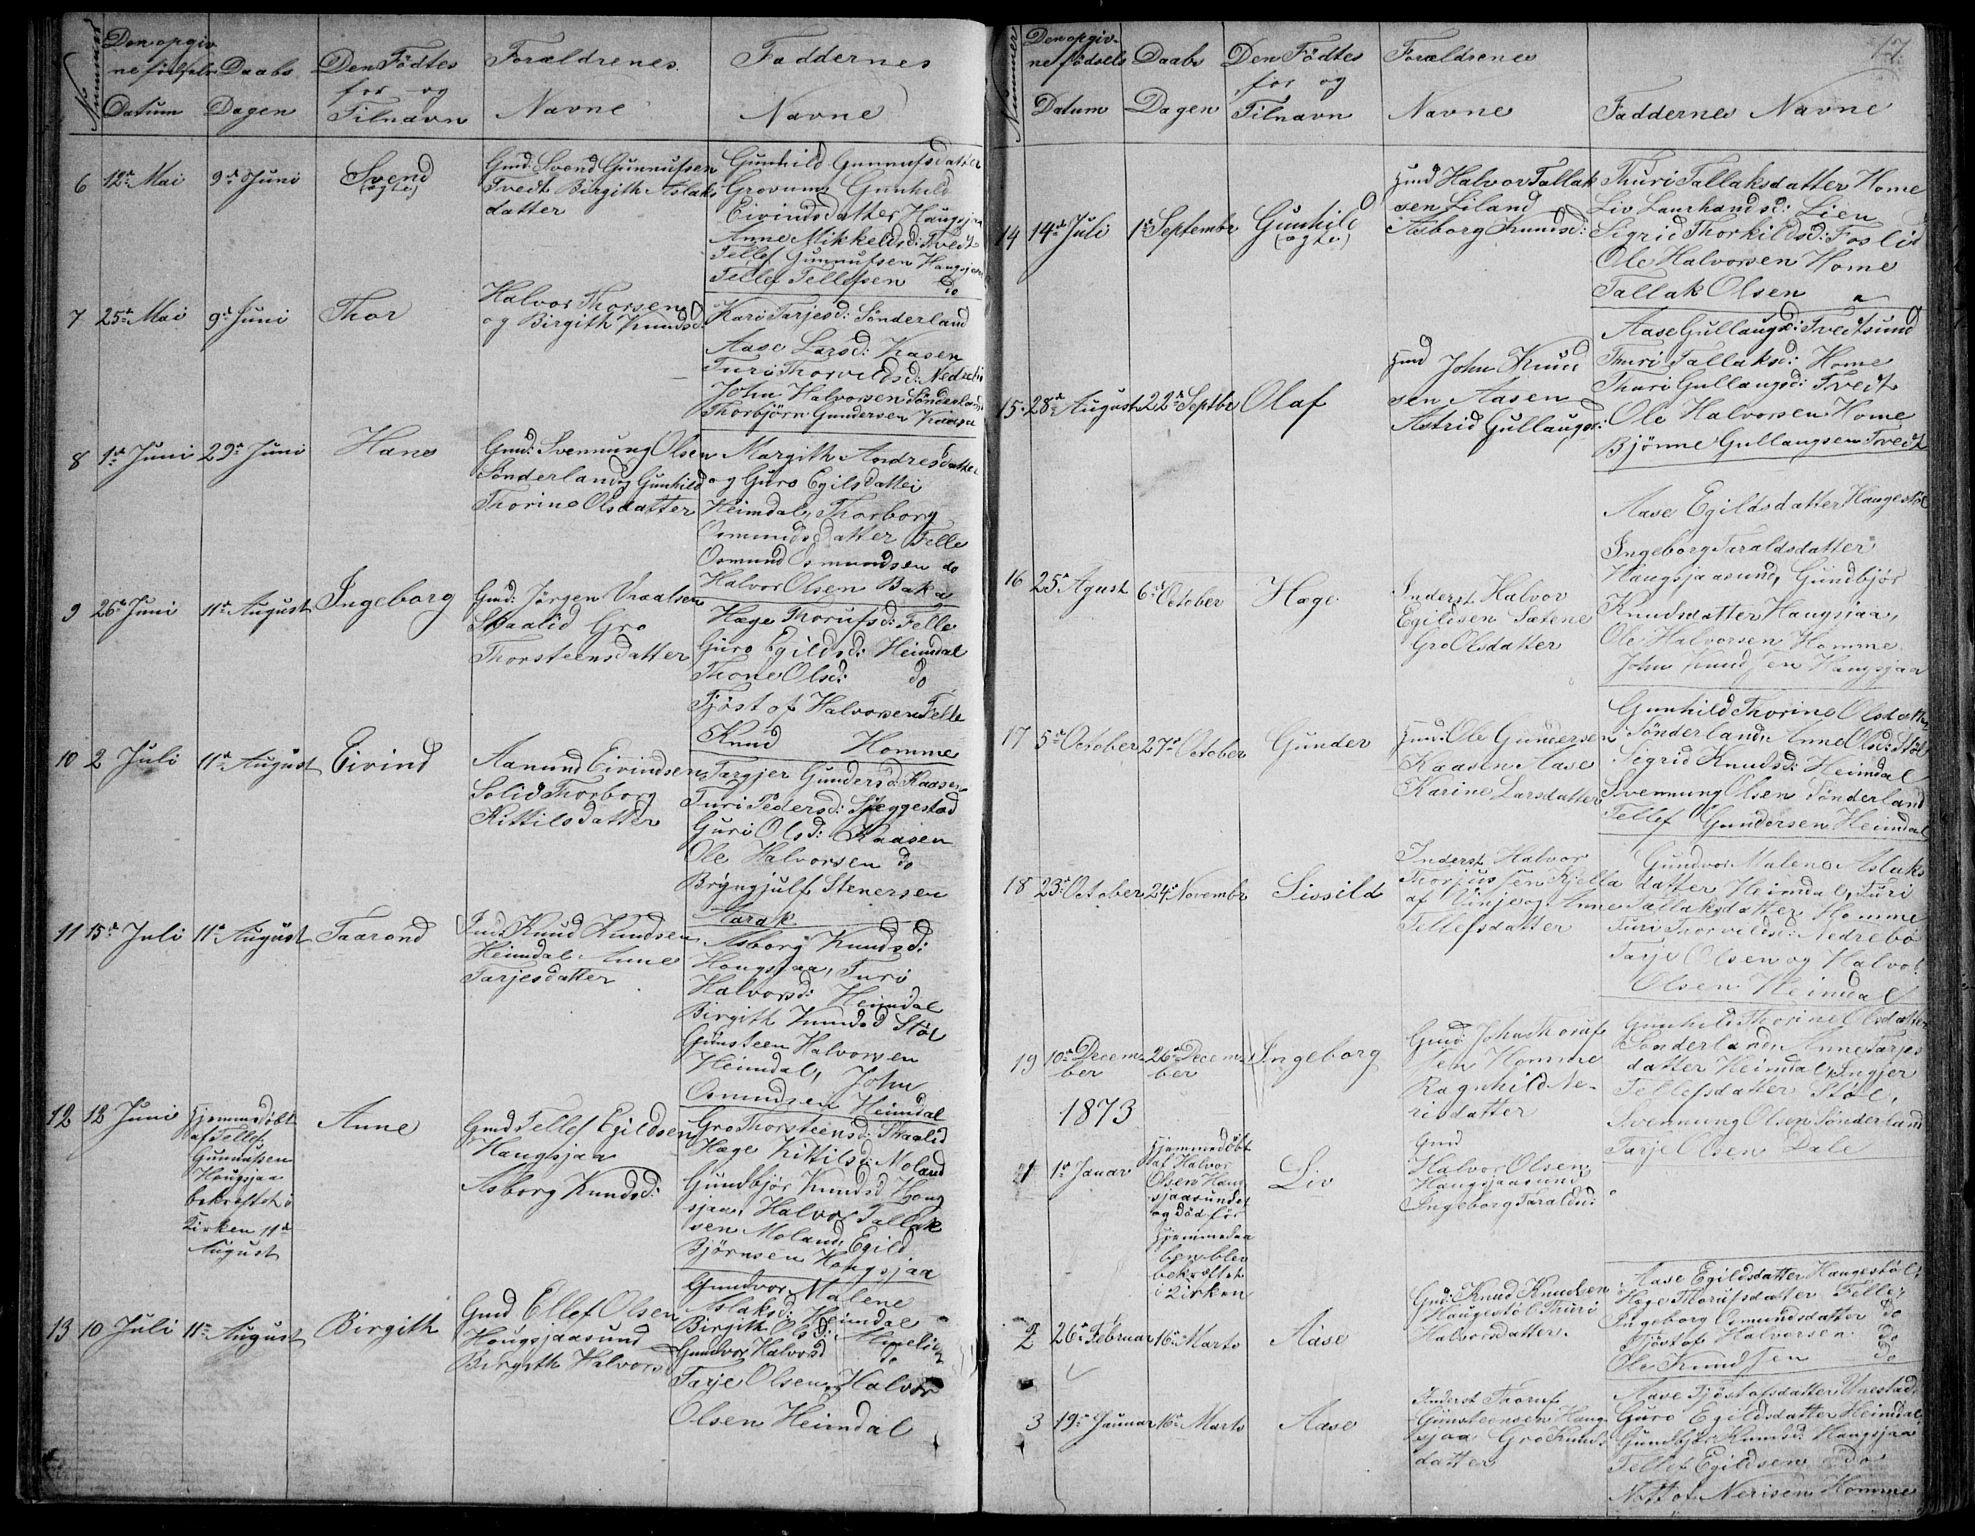 SAKO, Nissedal kirkebøker, G/Gb/L0002: Klokkerbok nr. II 2, 1863-1892, s. 17